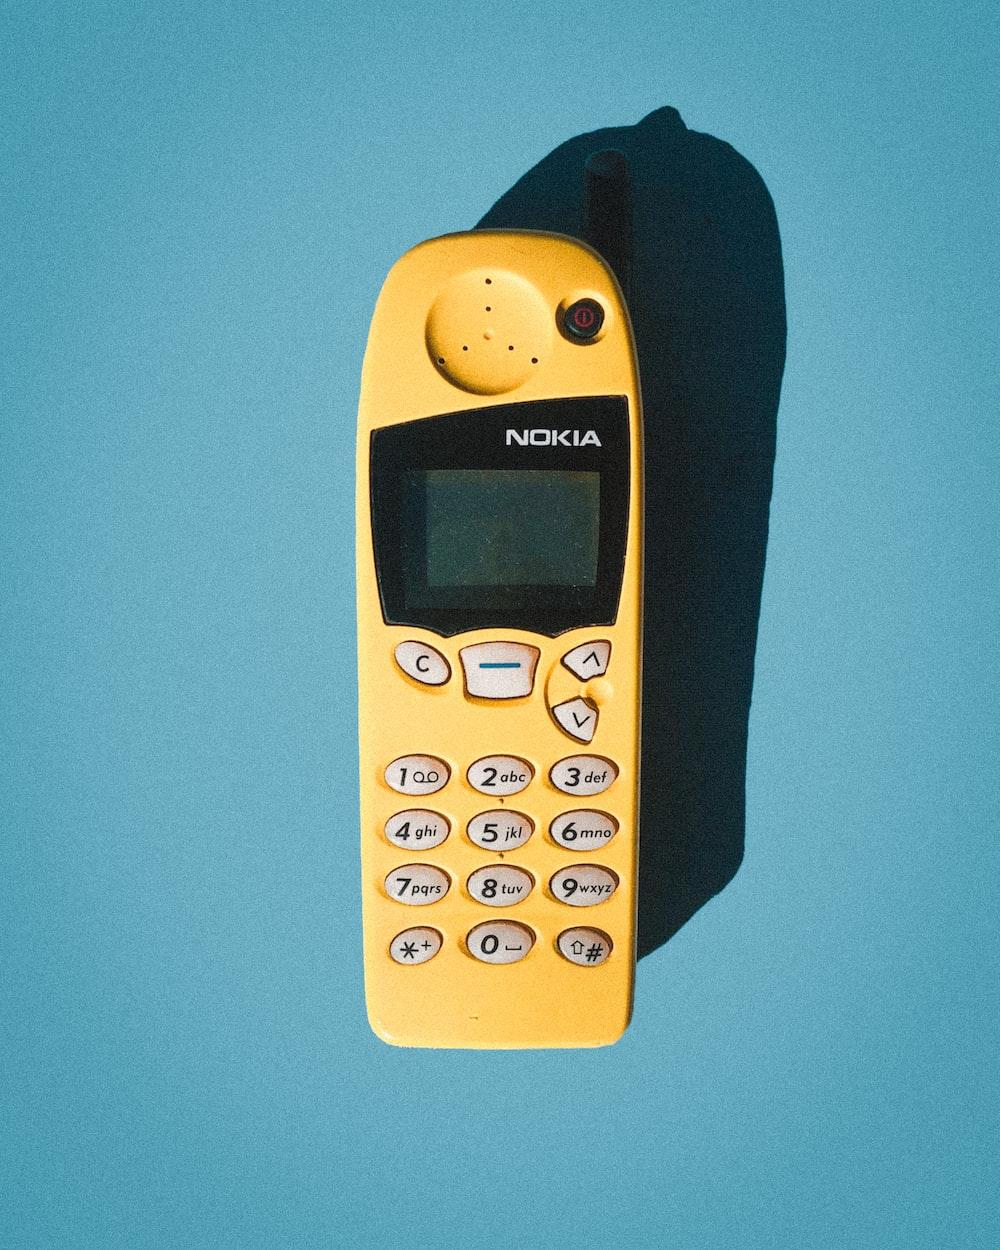 yellow and black 5110 telephone